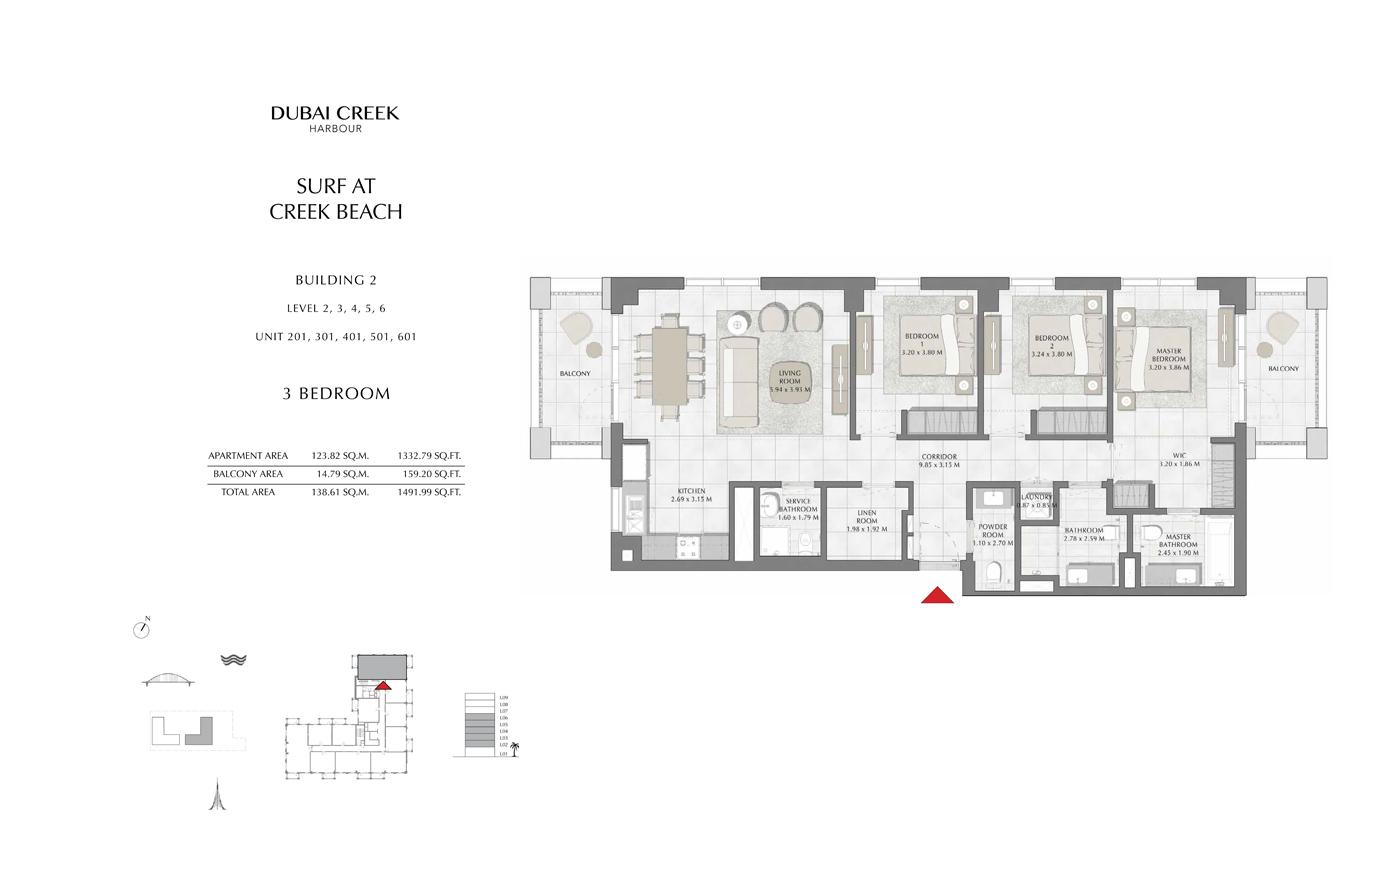 Building 2 , 3 Bedroom Level 7, Size 1491 Sq Ft